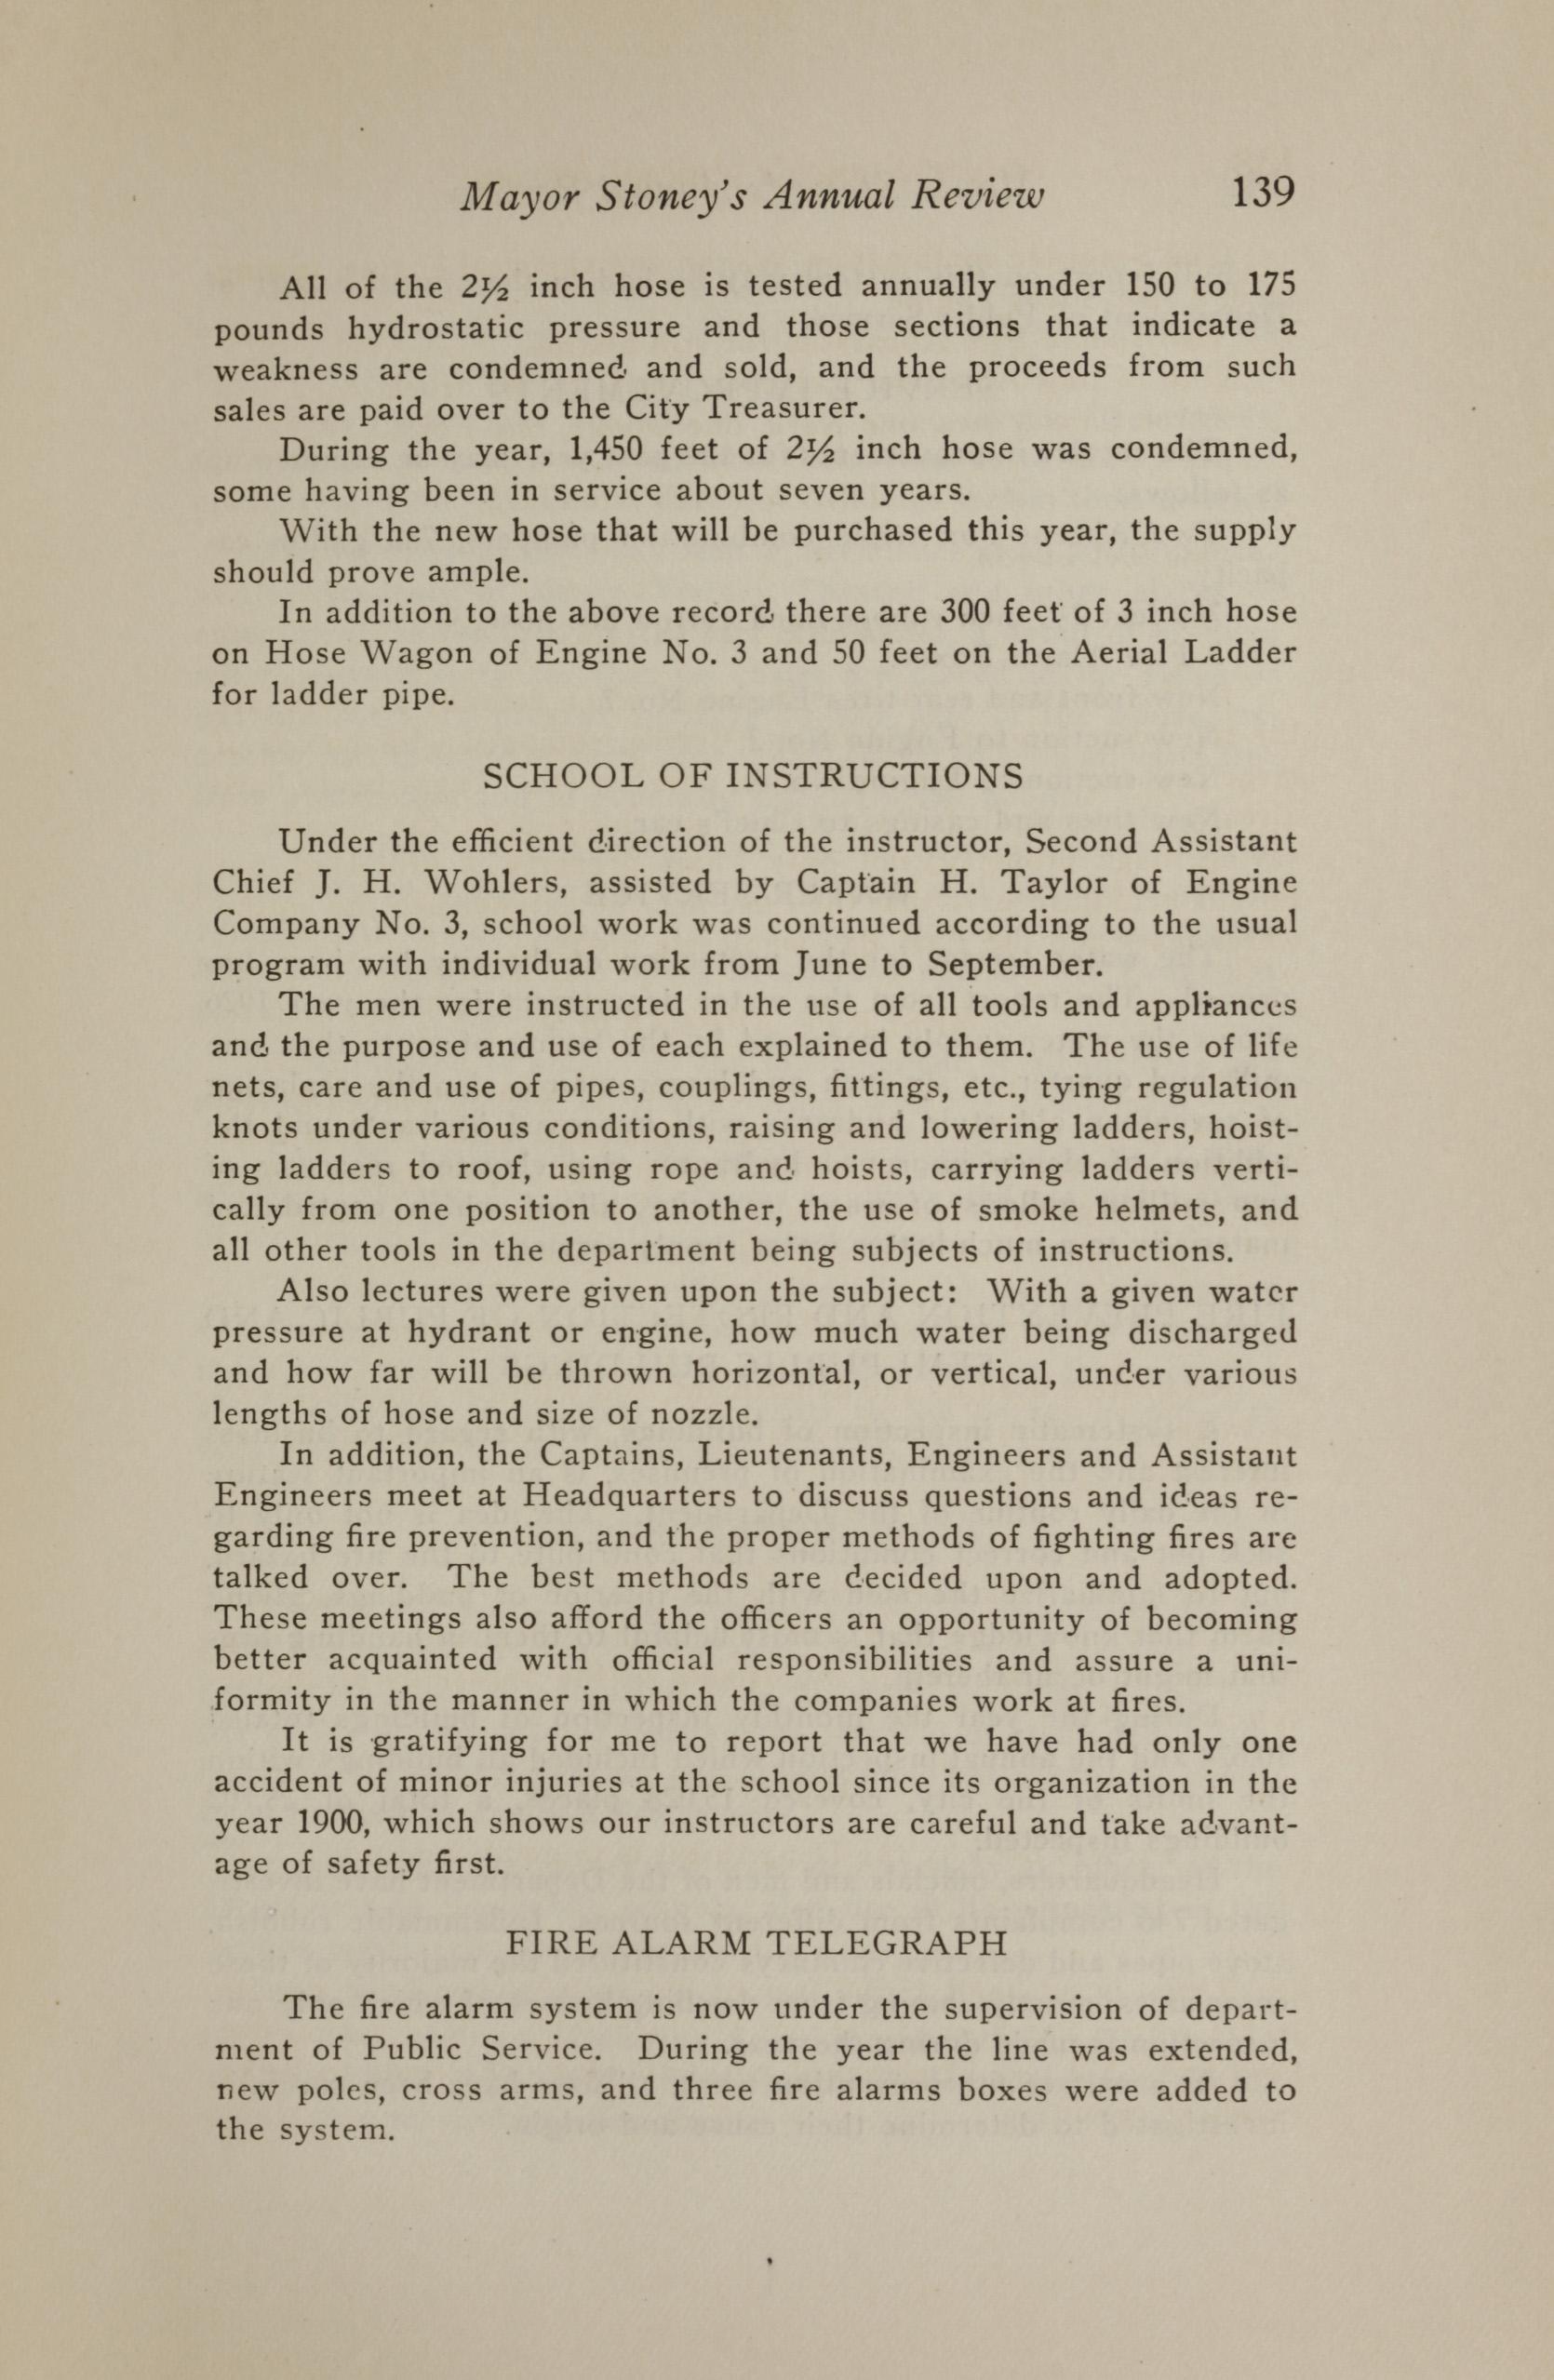 Charleston Yearbook, 1926, page 139